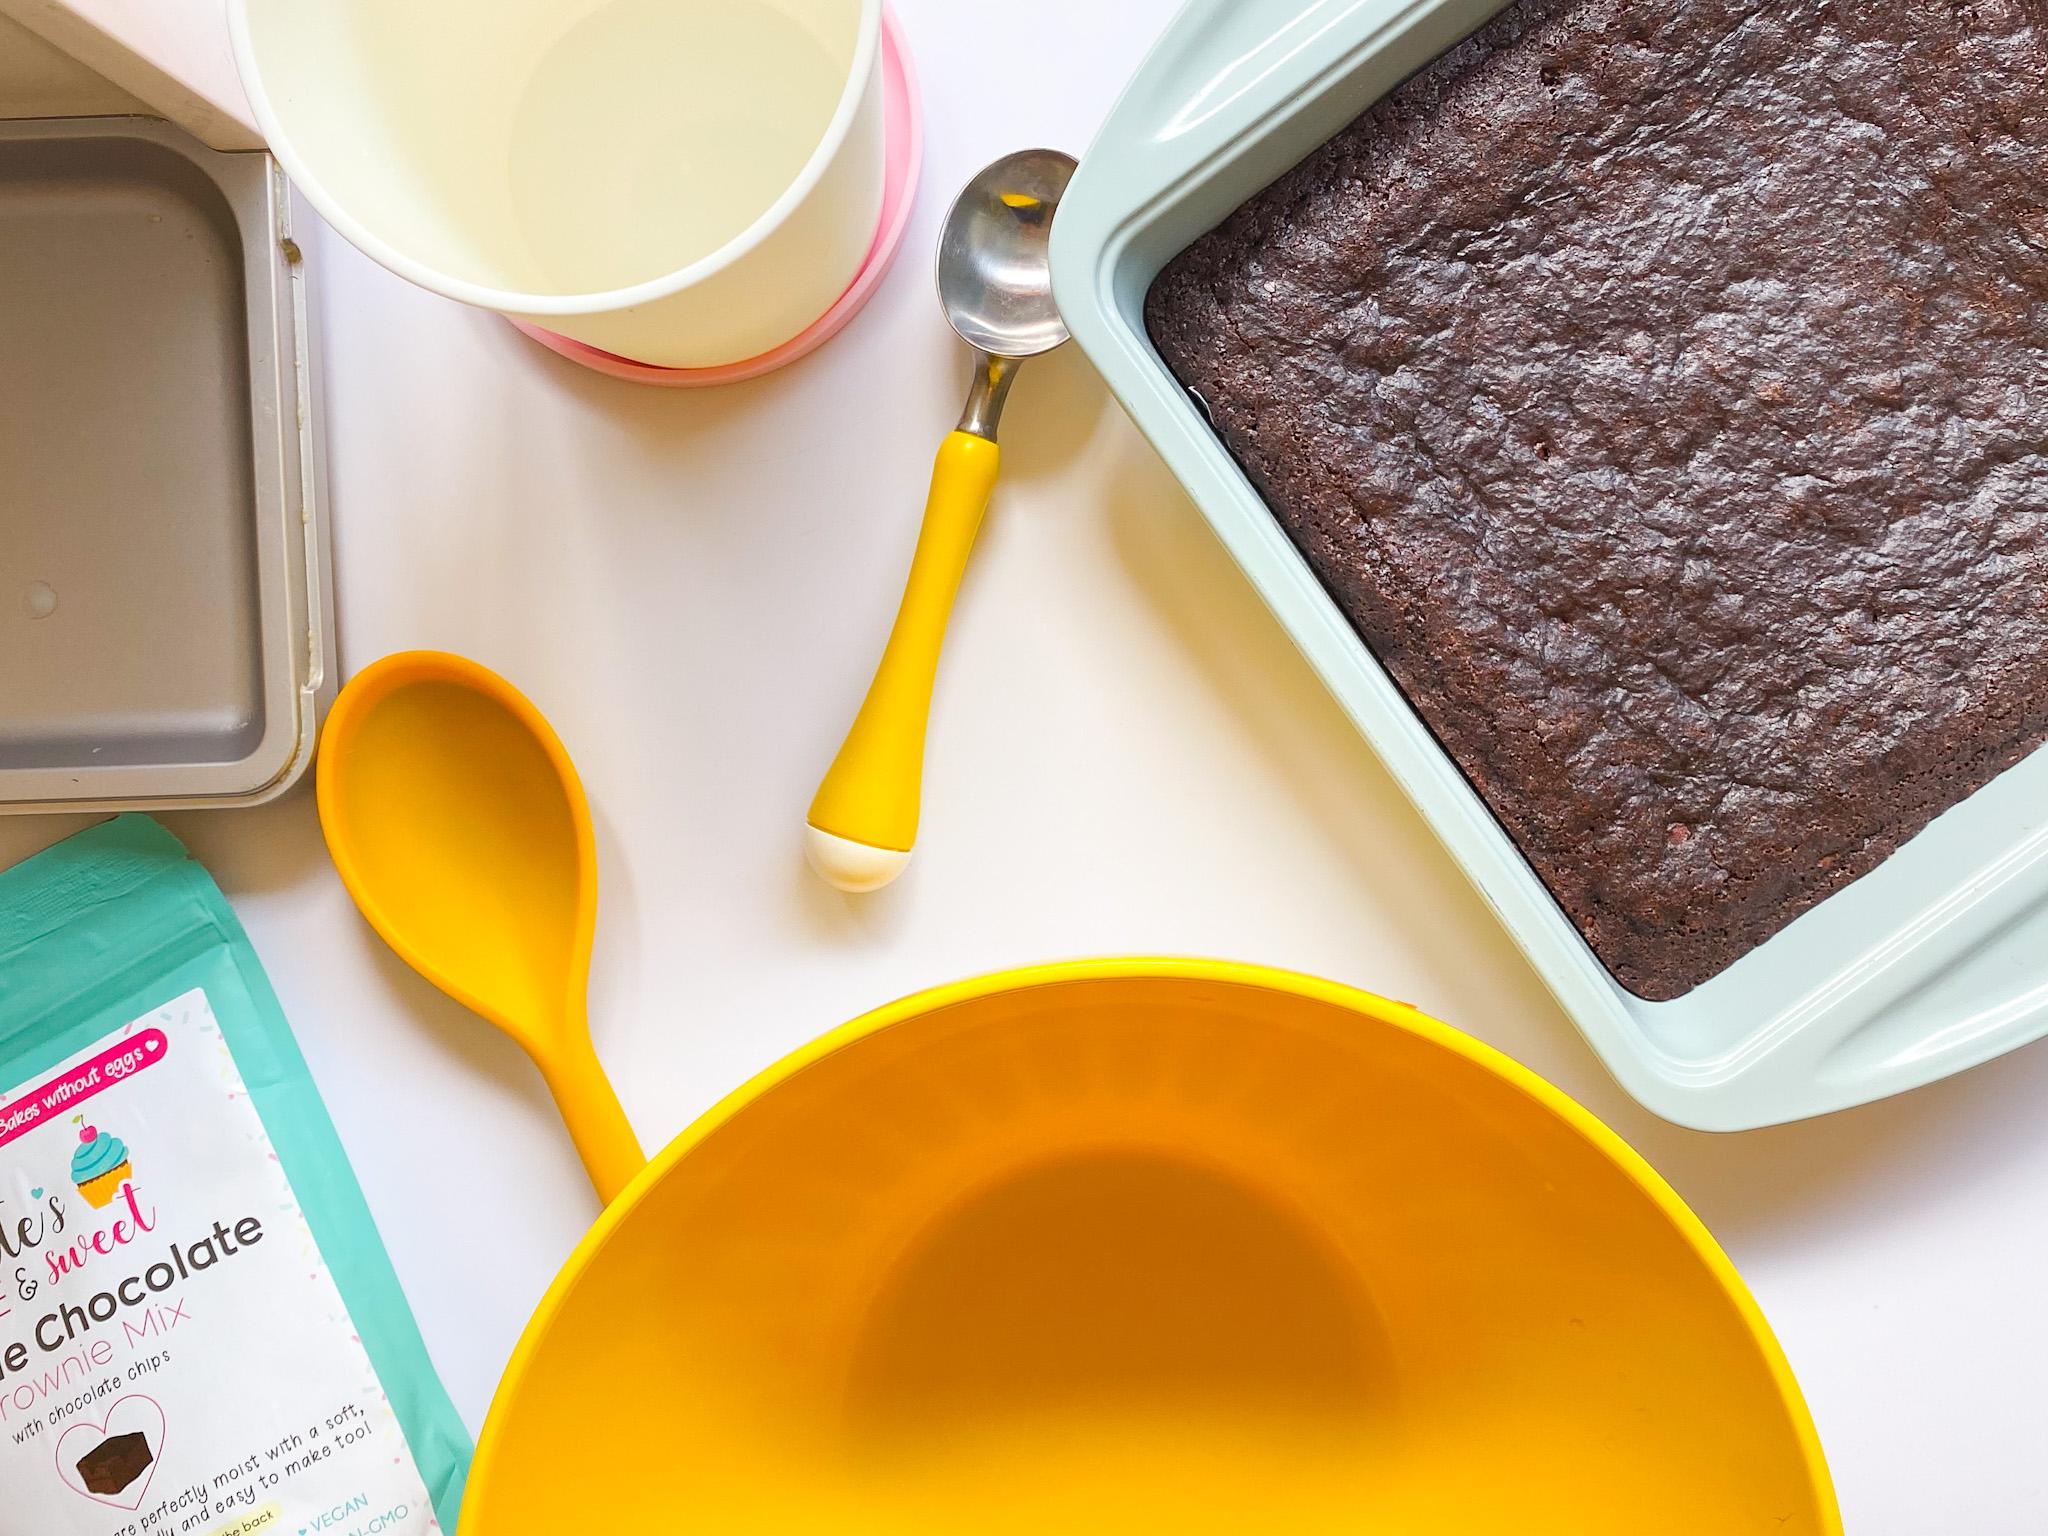 Kate's Safe & Sweet - Brownie Ice Cream Tools